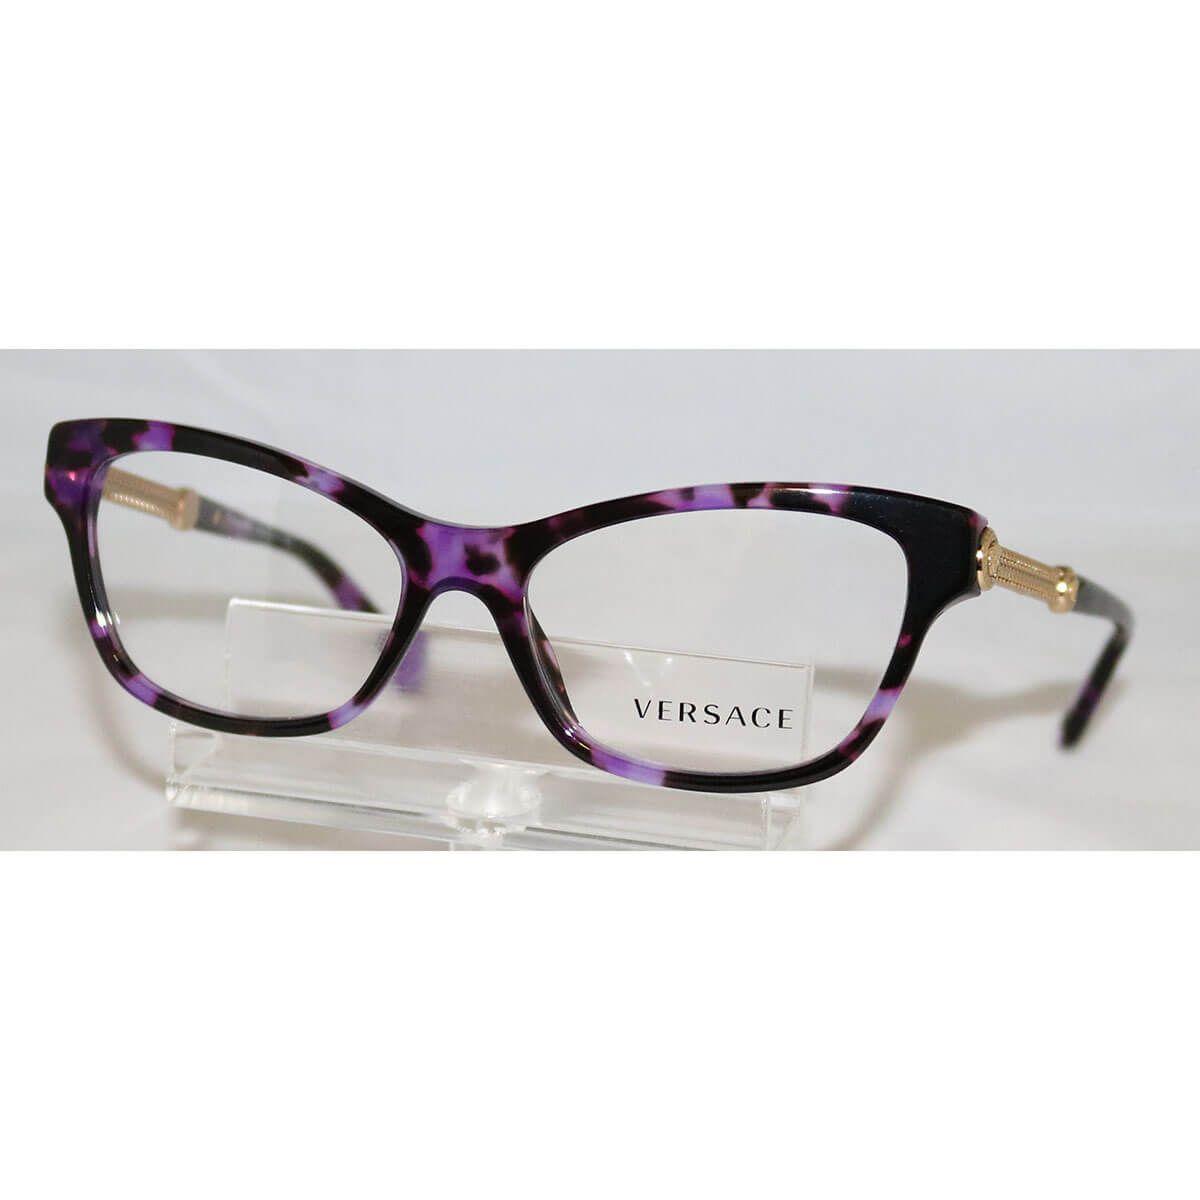 d8aaa09e78 Versace Violet Havana VE 3214 5152 Cat Eye eyeglasses 329.99  89.95 ...